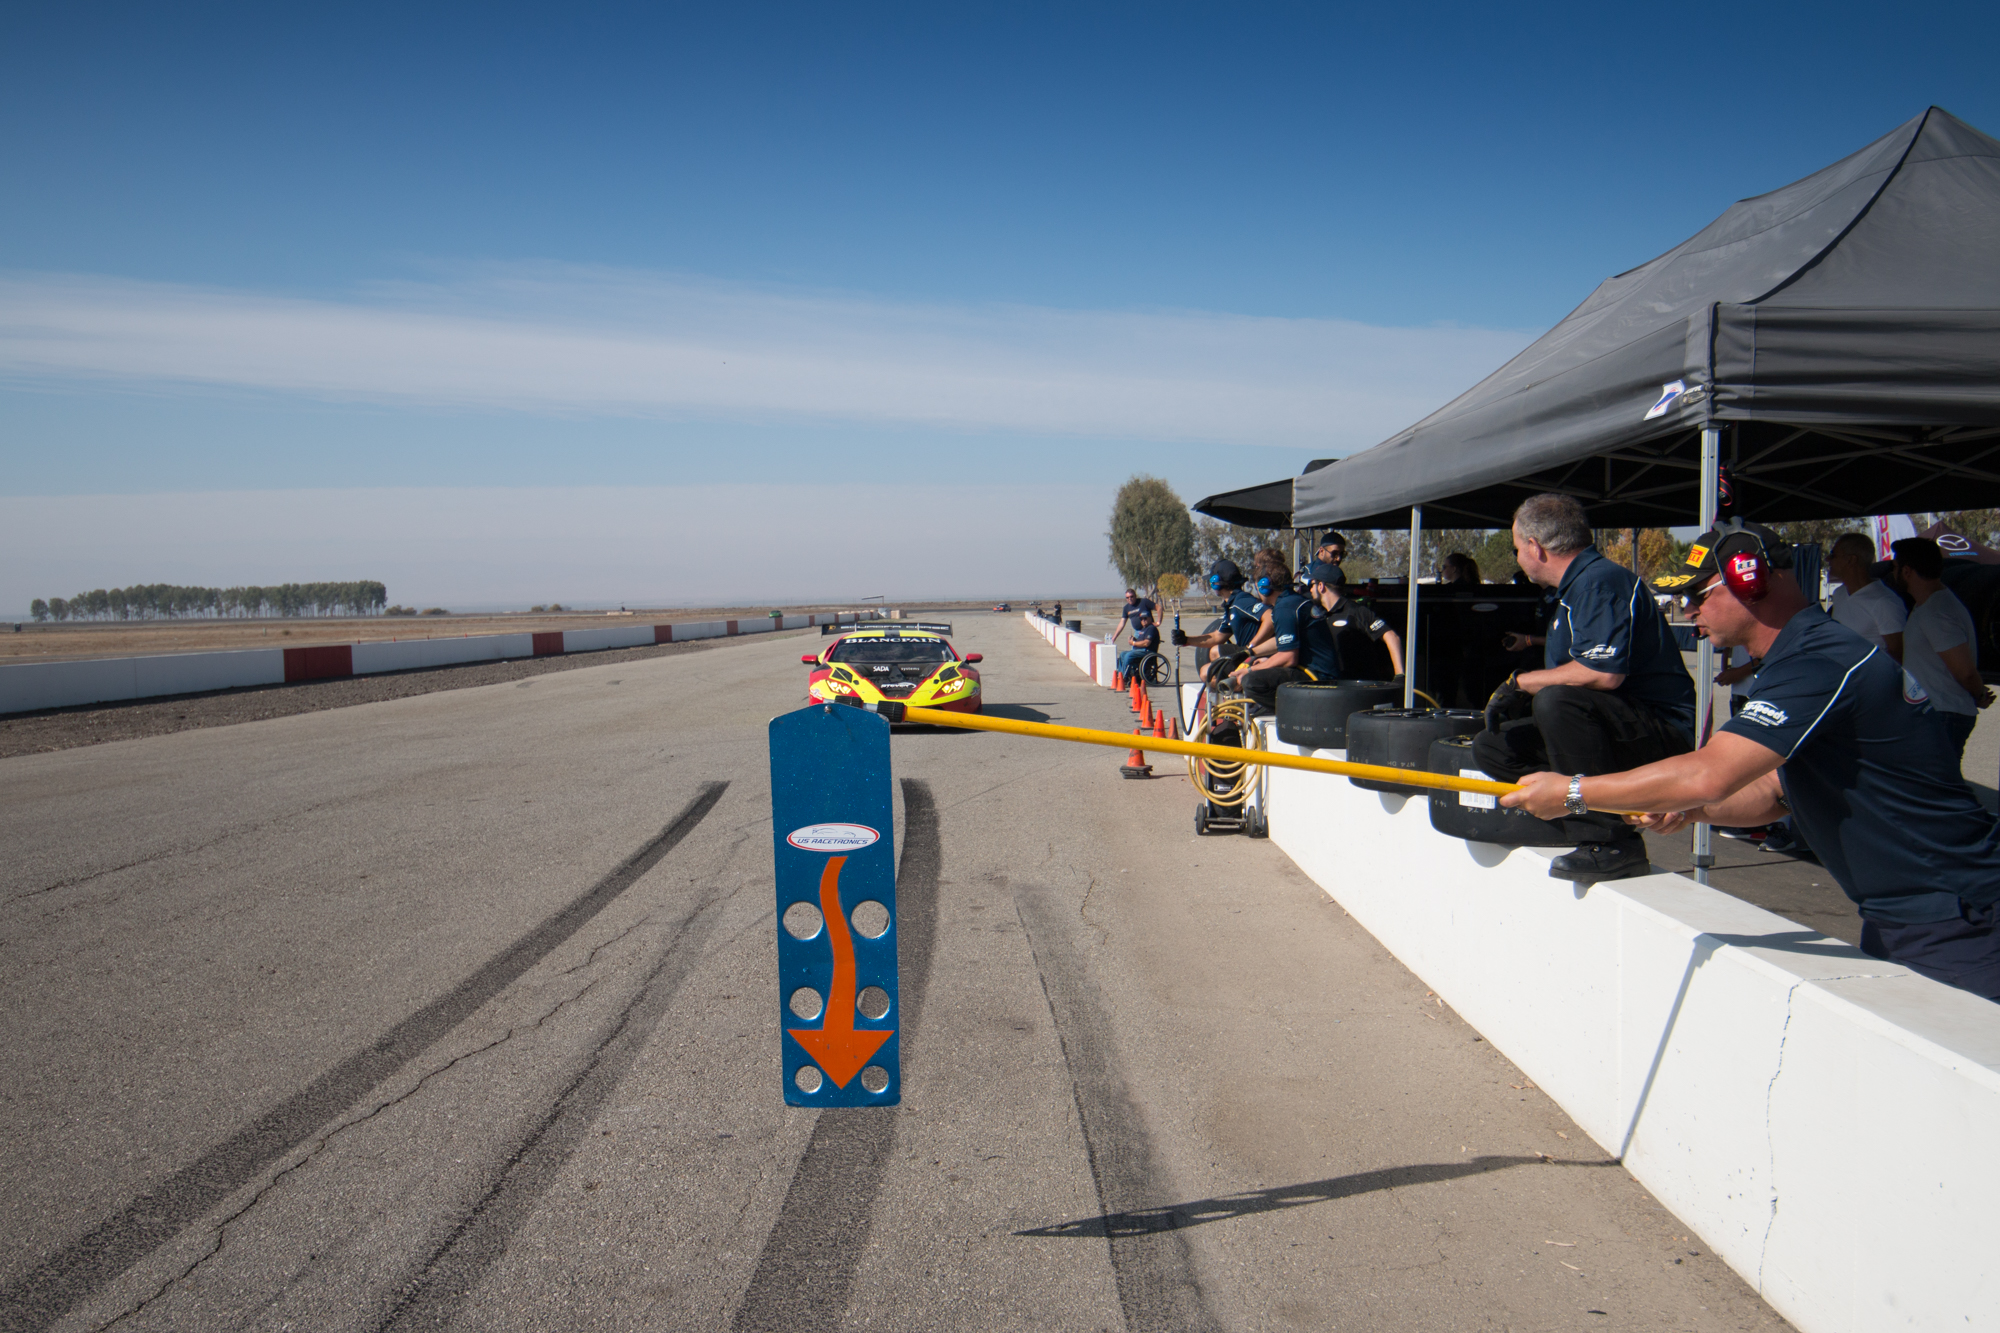 Steven-Racing-20130228-55349.jpg